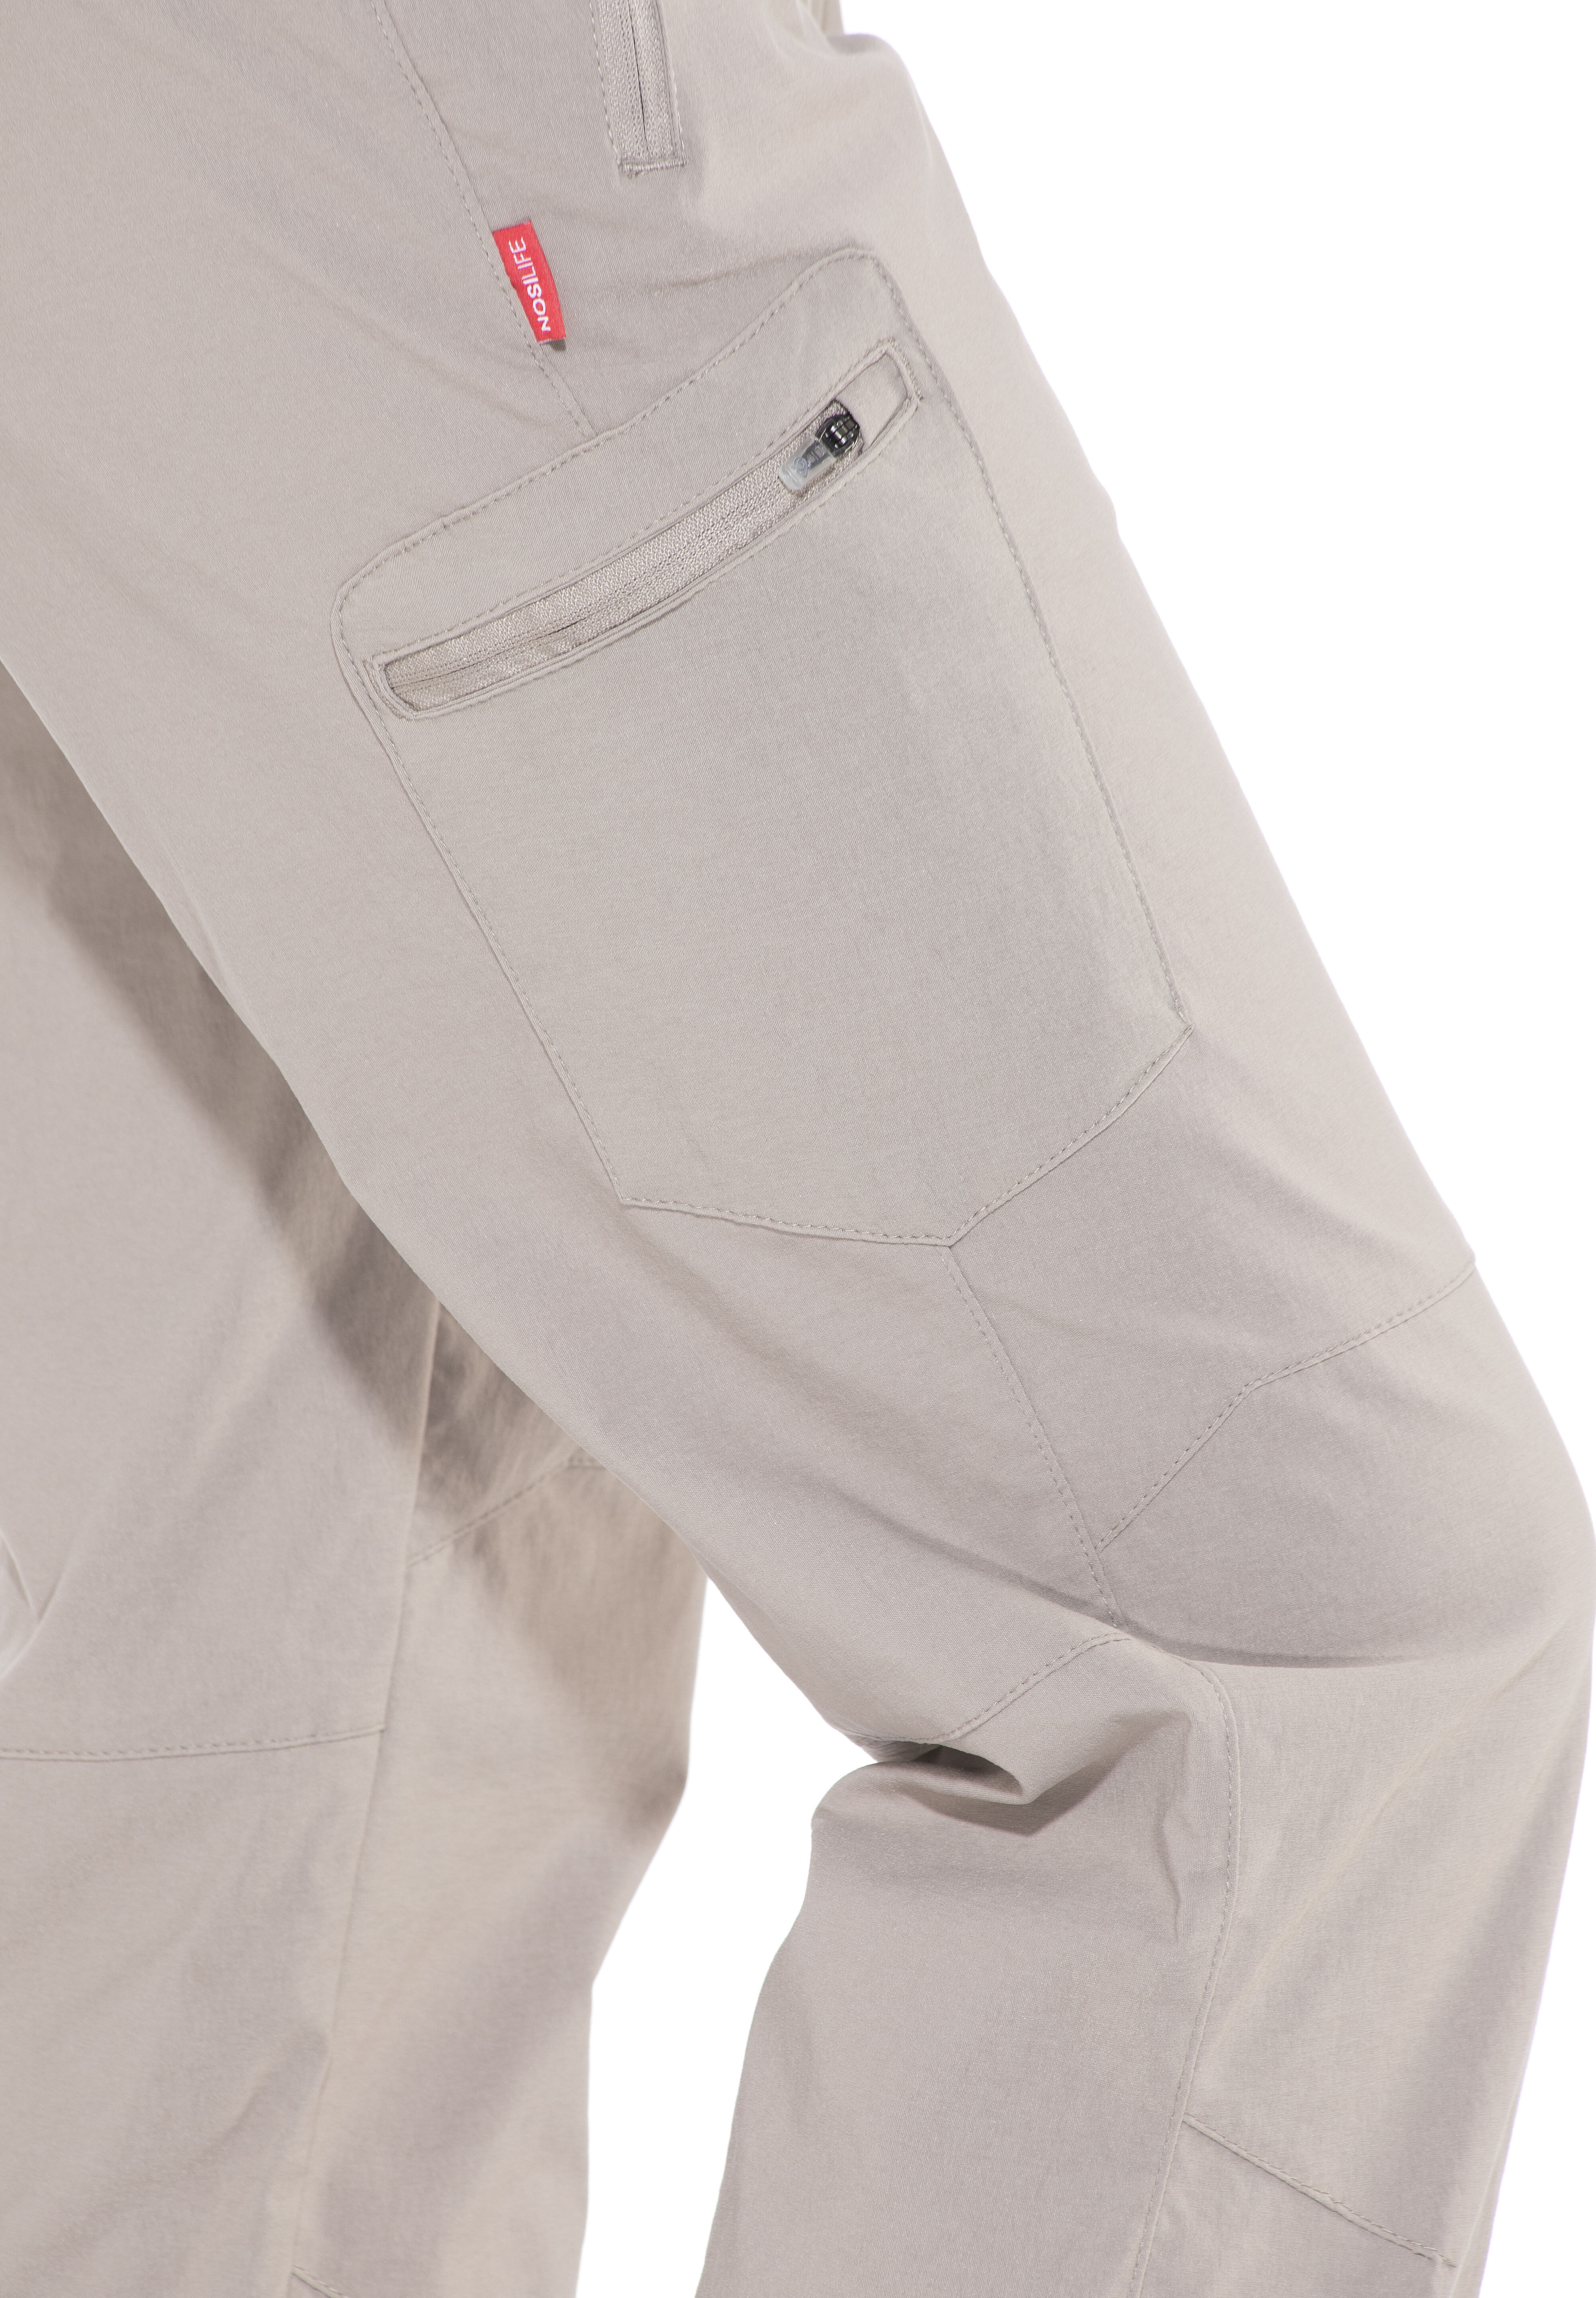 Craghoppers NosiLife Pro Naiset Pitkät housut  780e74b73c